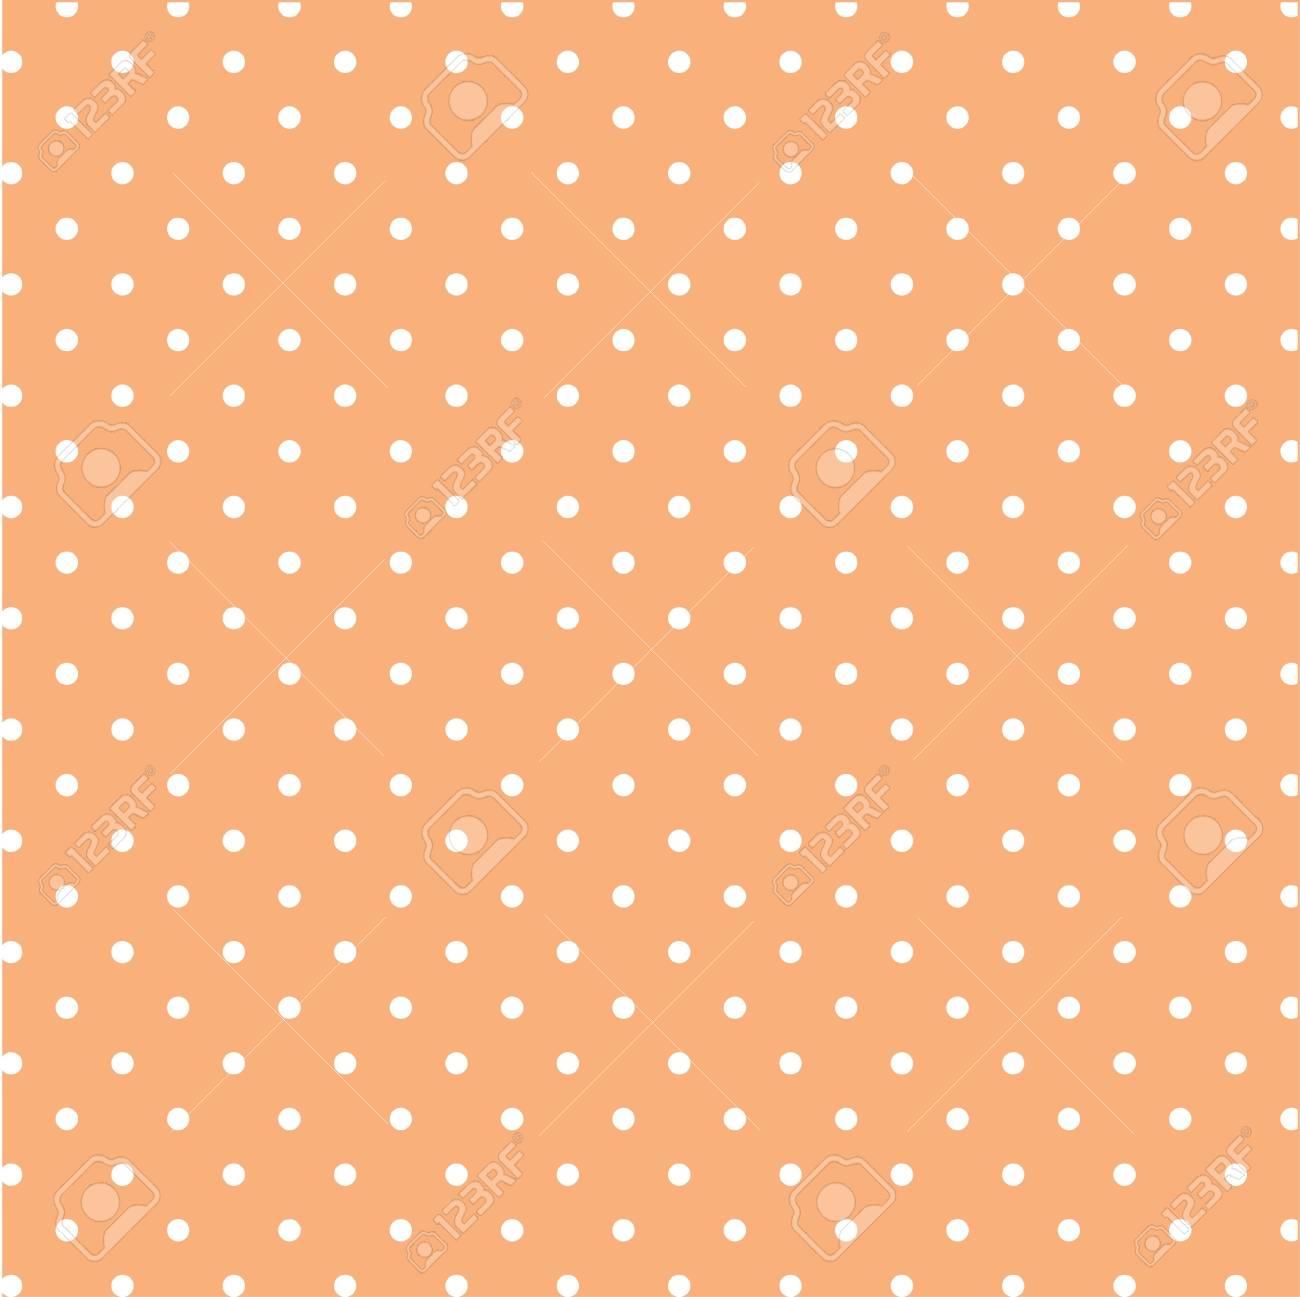 Seamless polka dot background pattern - 114708498